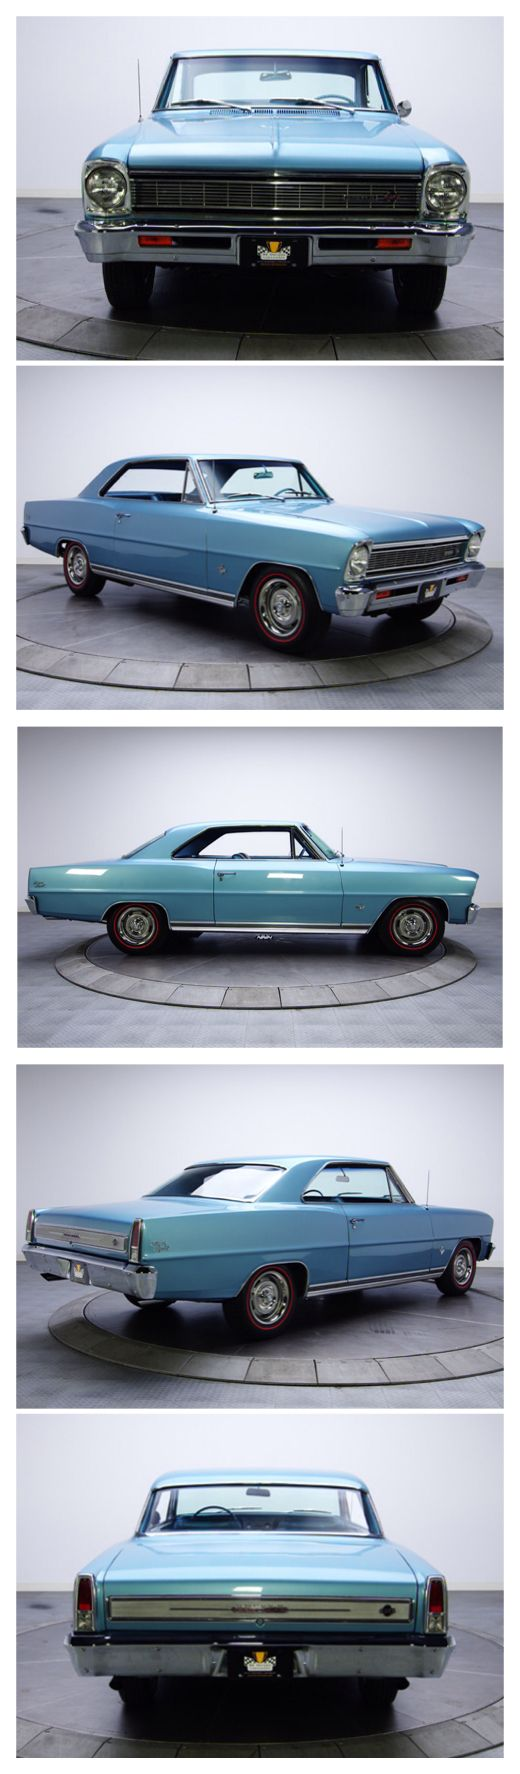 1965 chevy ii nova ss favorite cars american muscle pinterest - 1966 Chevy Nova Ss